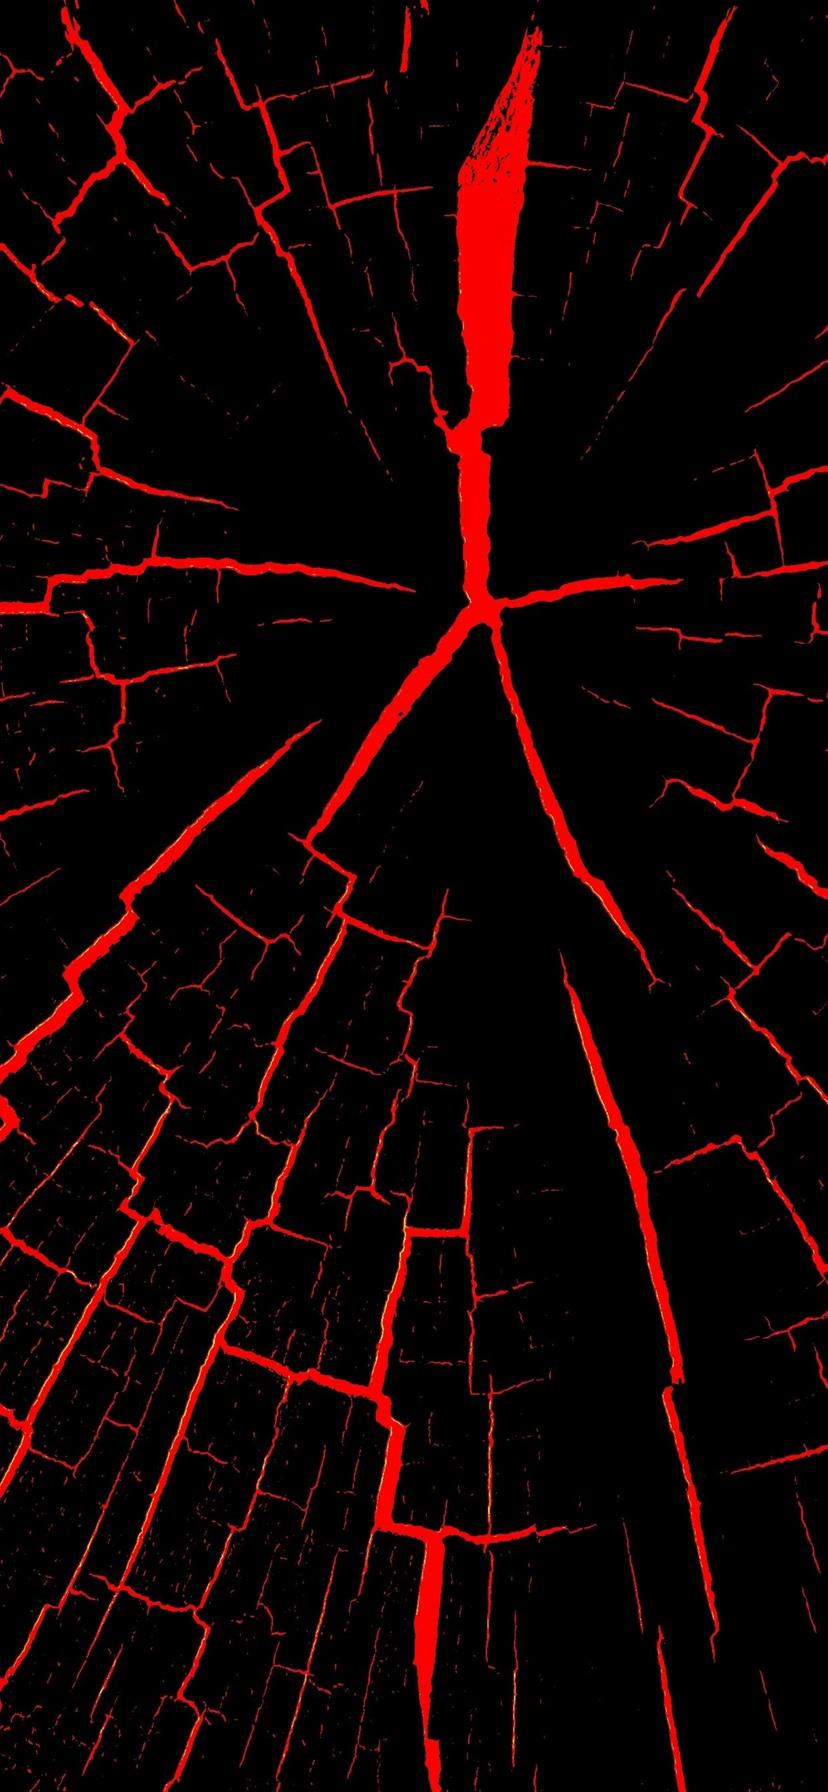 Cracks black and red